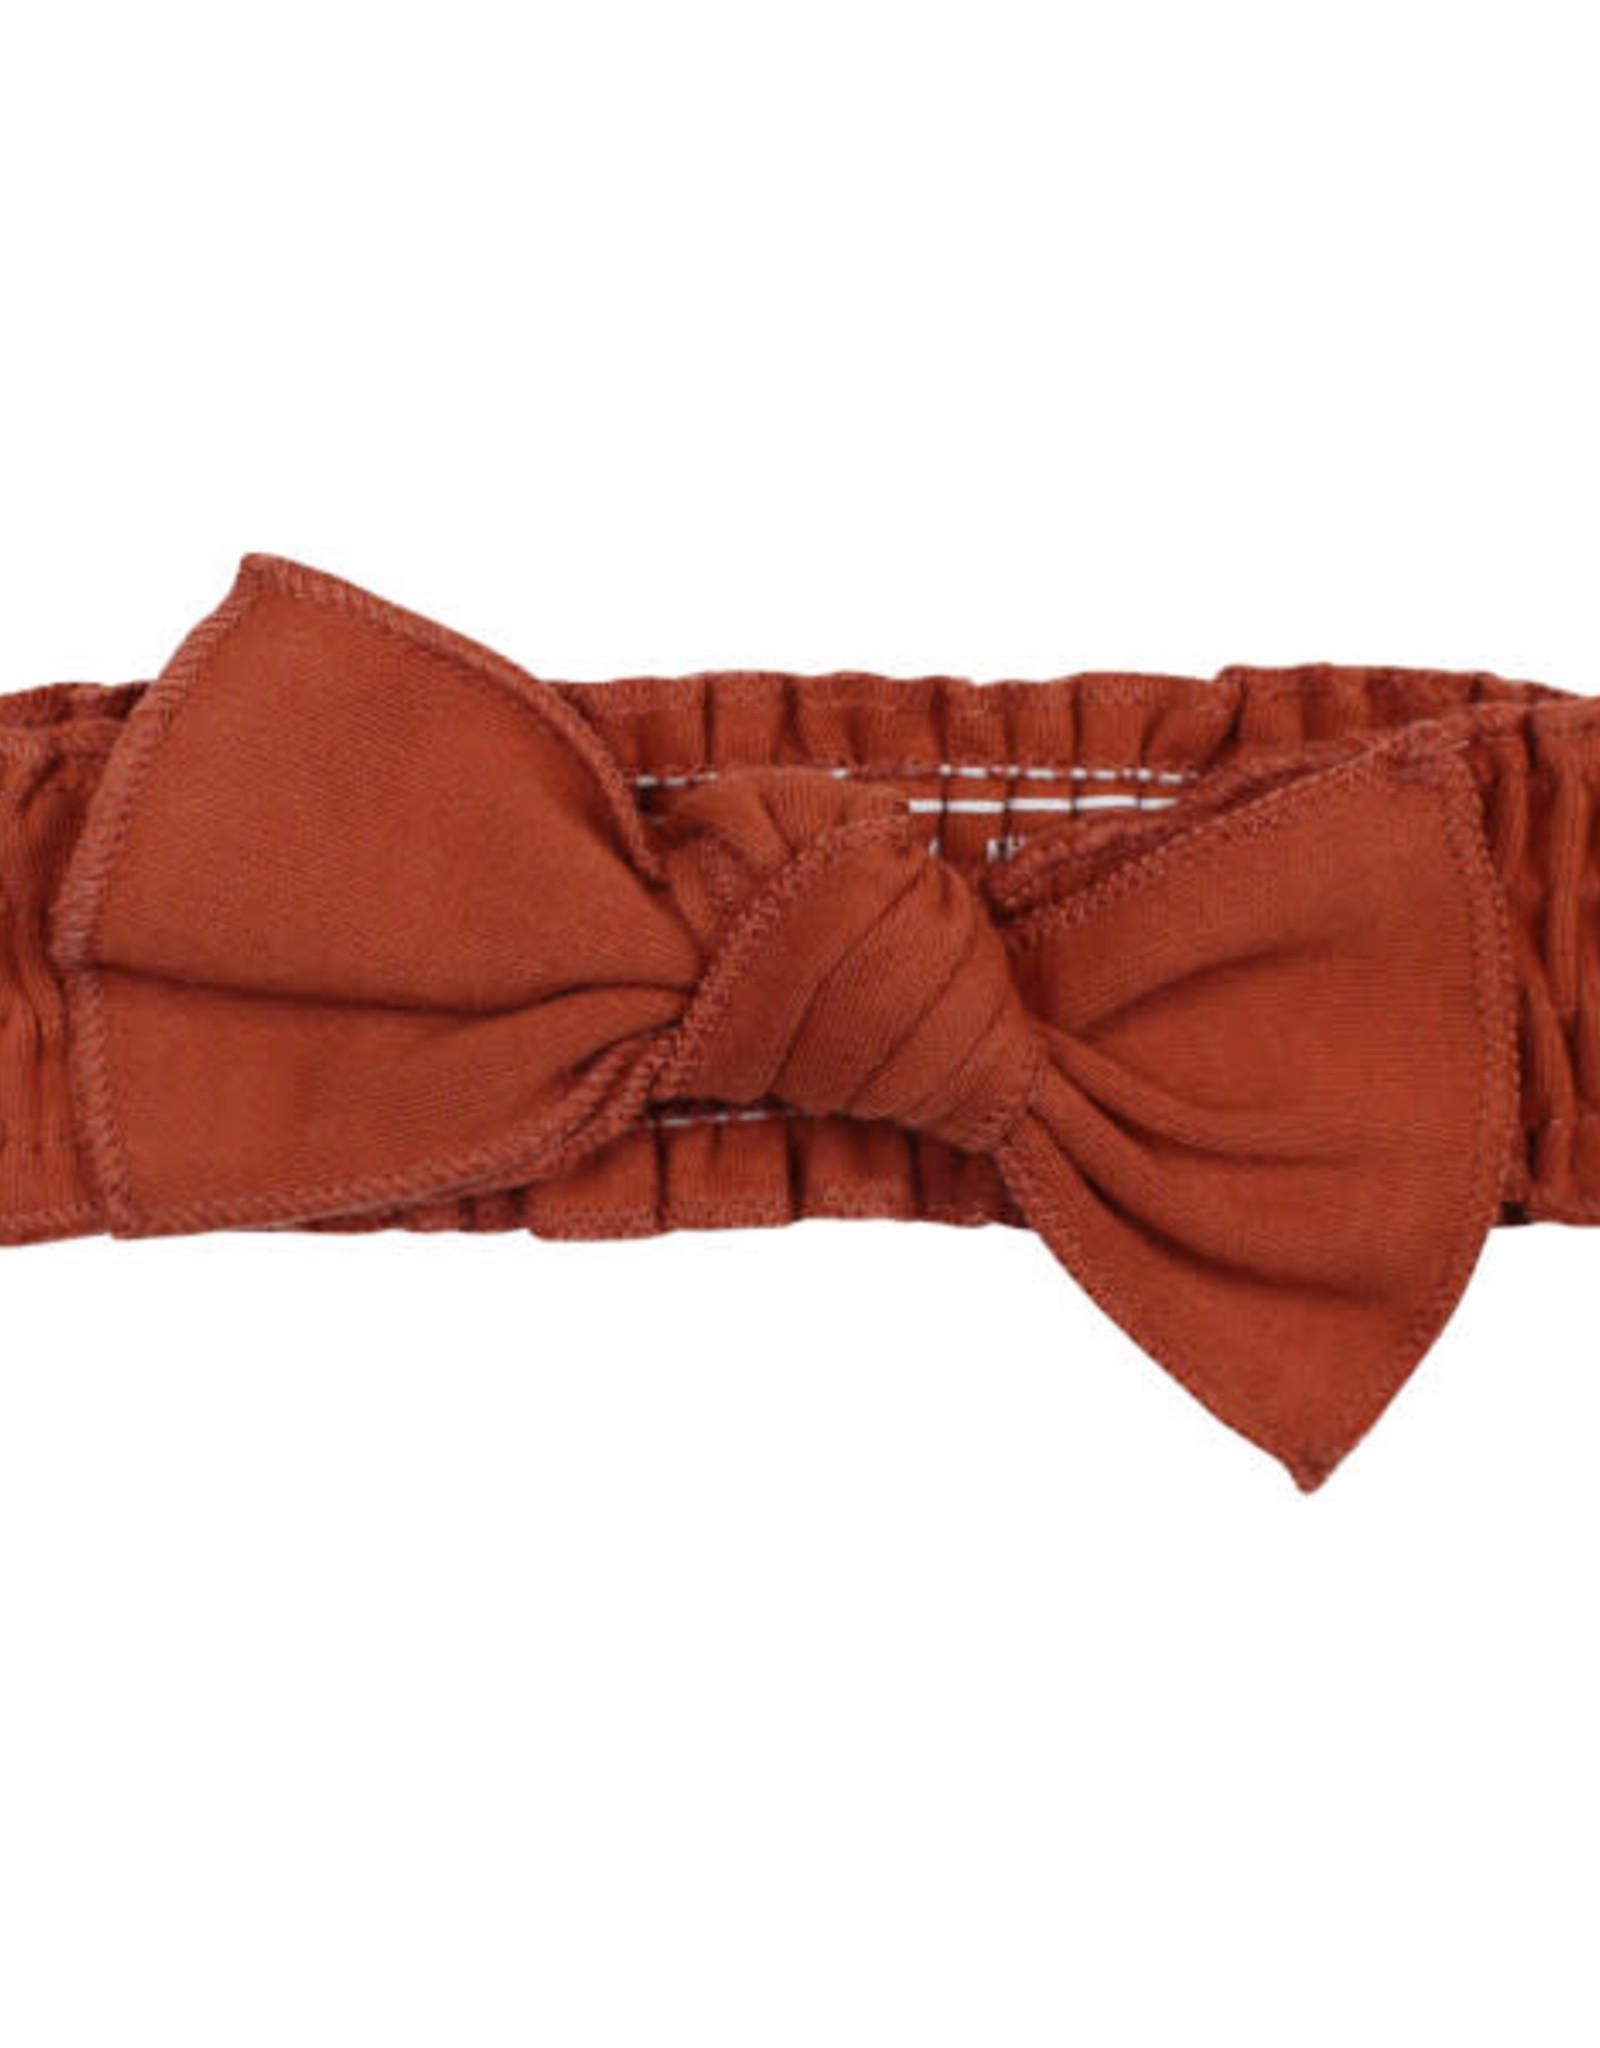 L'oved Baby Smocked Tie Headband Cinnamon 0-12m